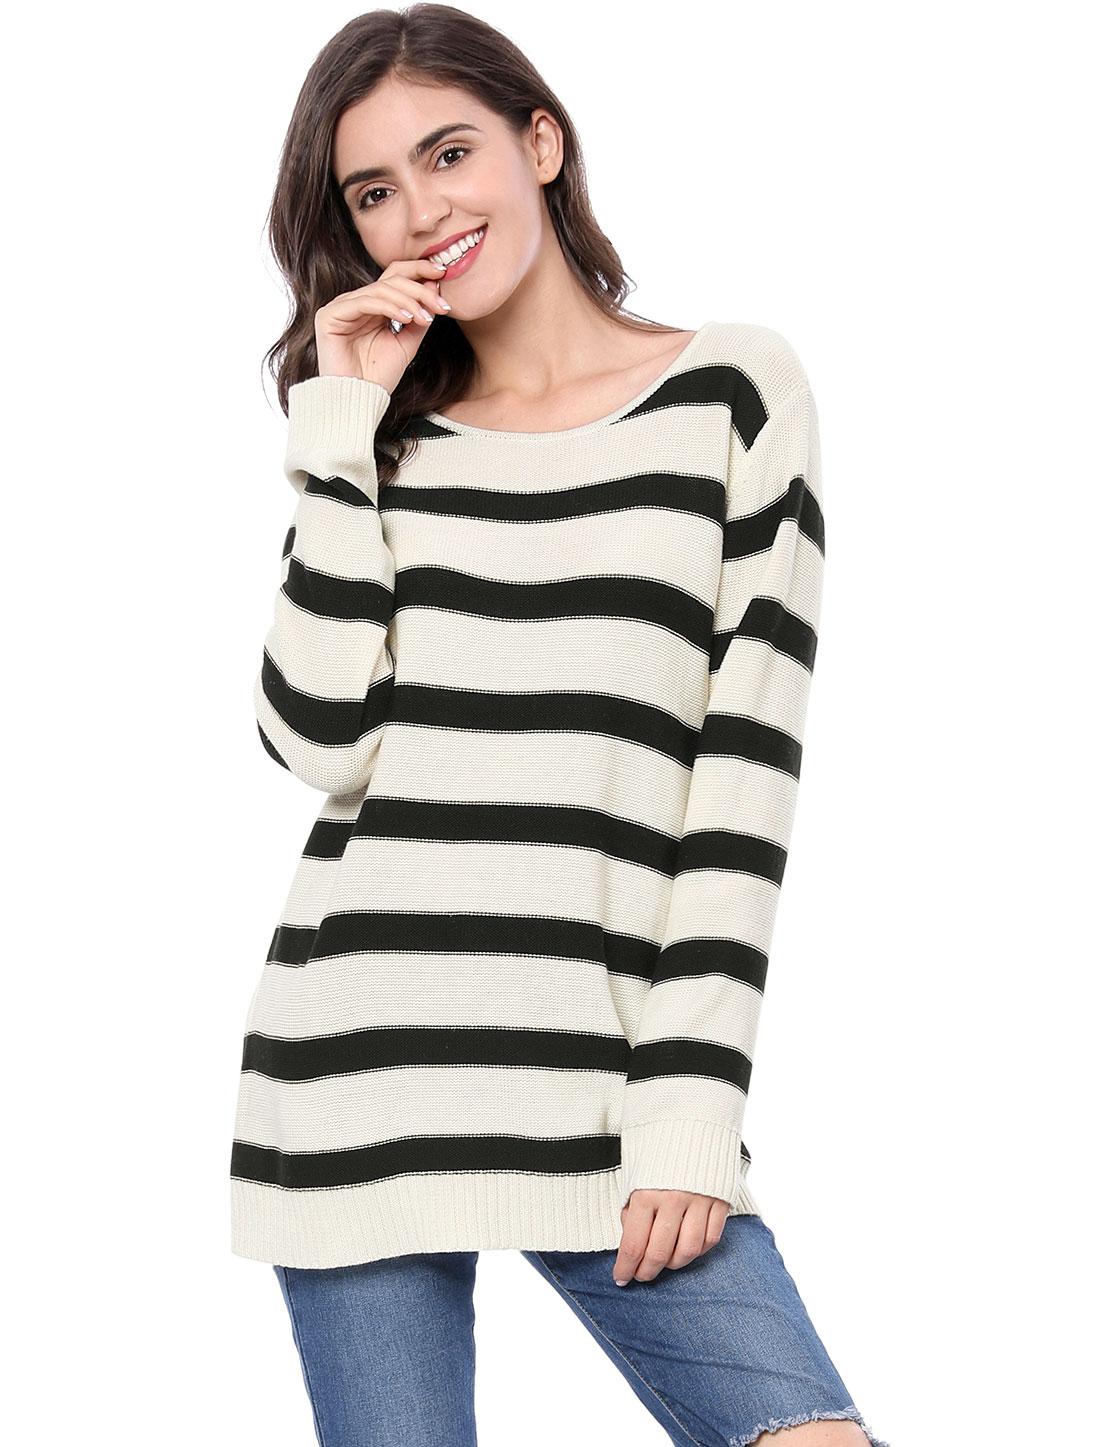 Allegra K Women Long Sleeves Drop Shoulder Loose Striped Sweater White M